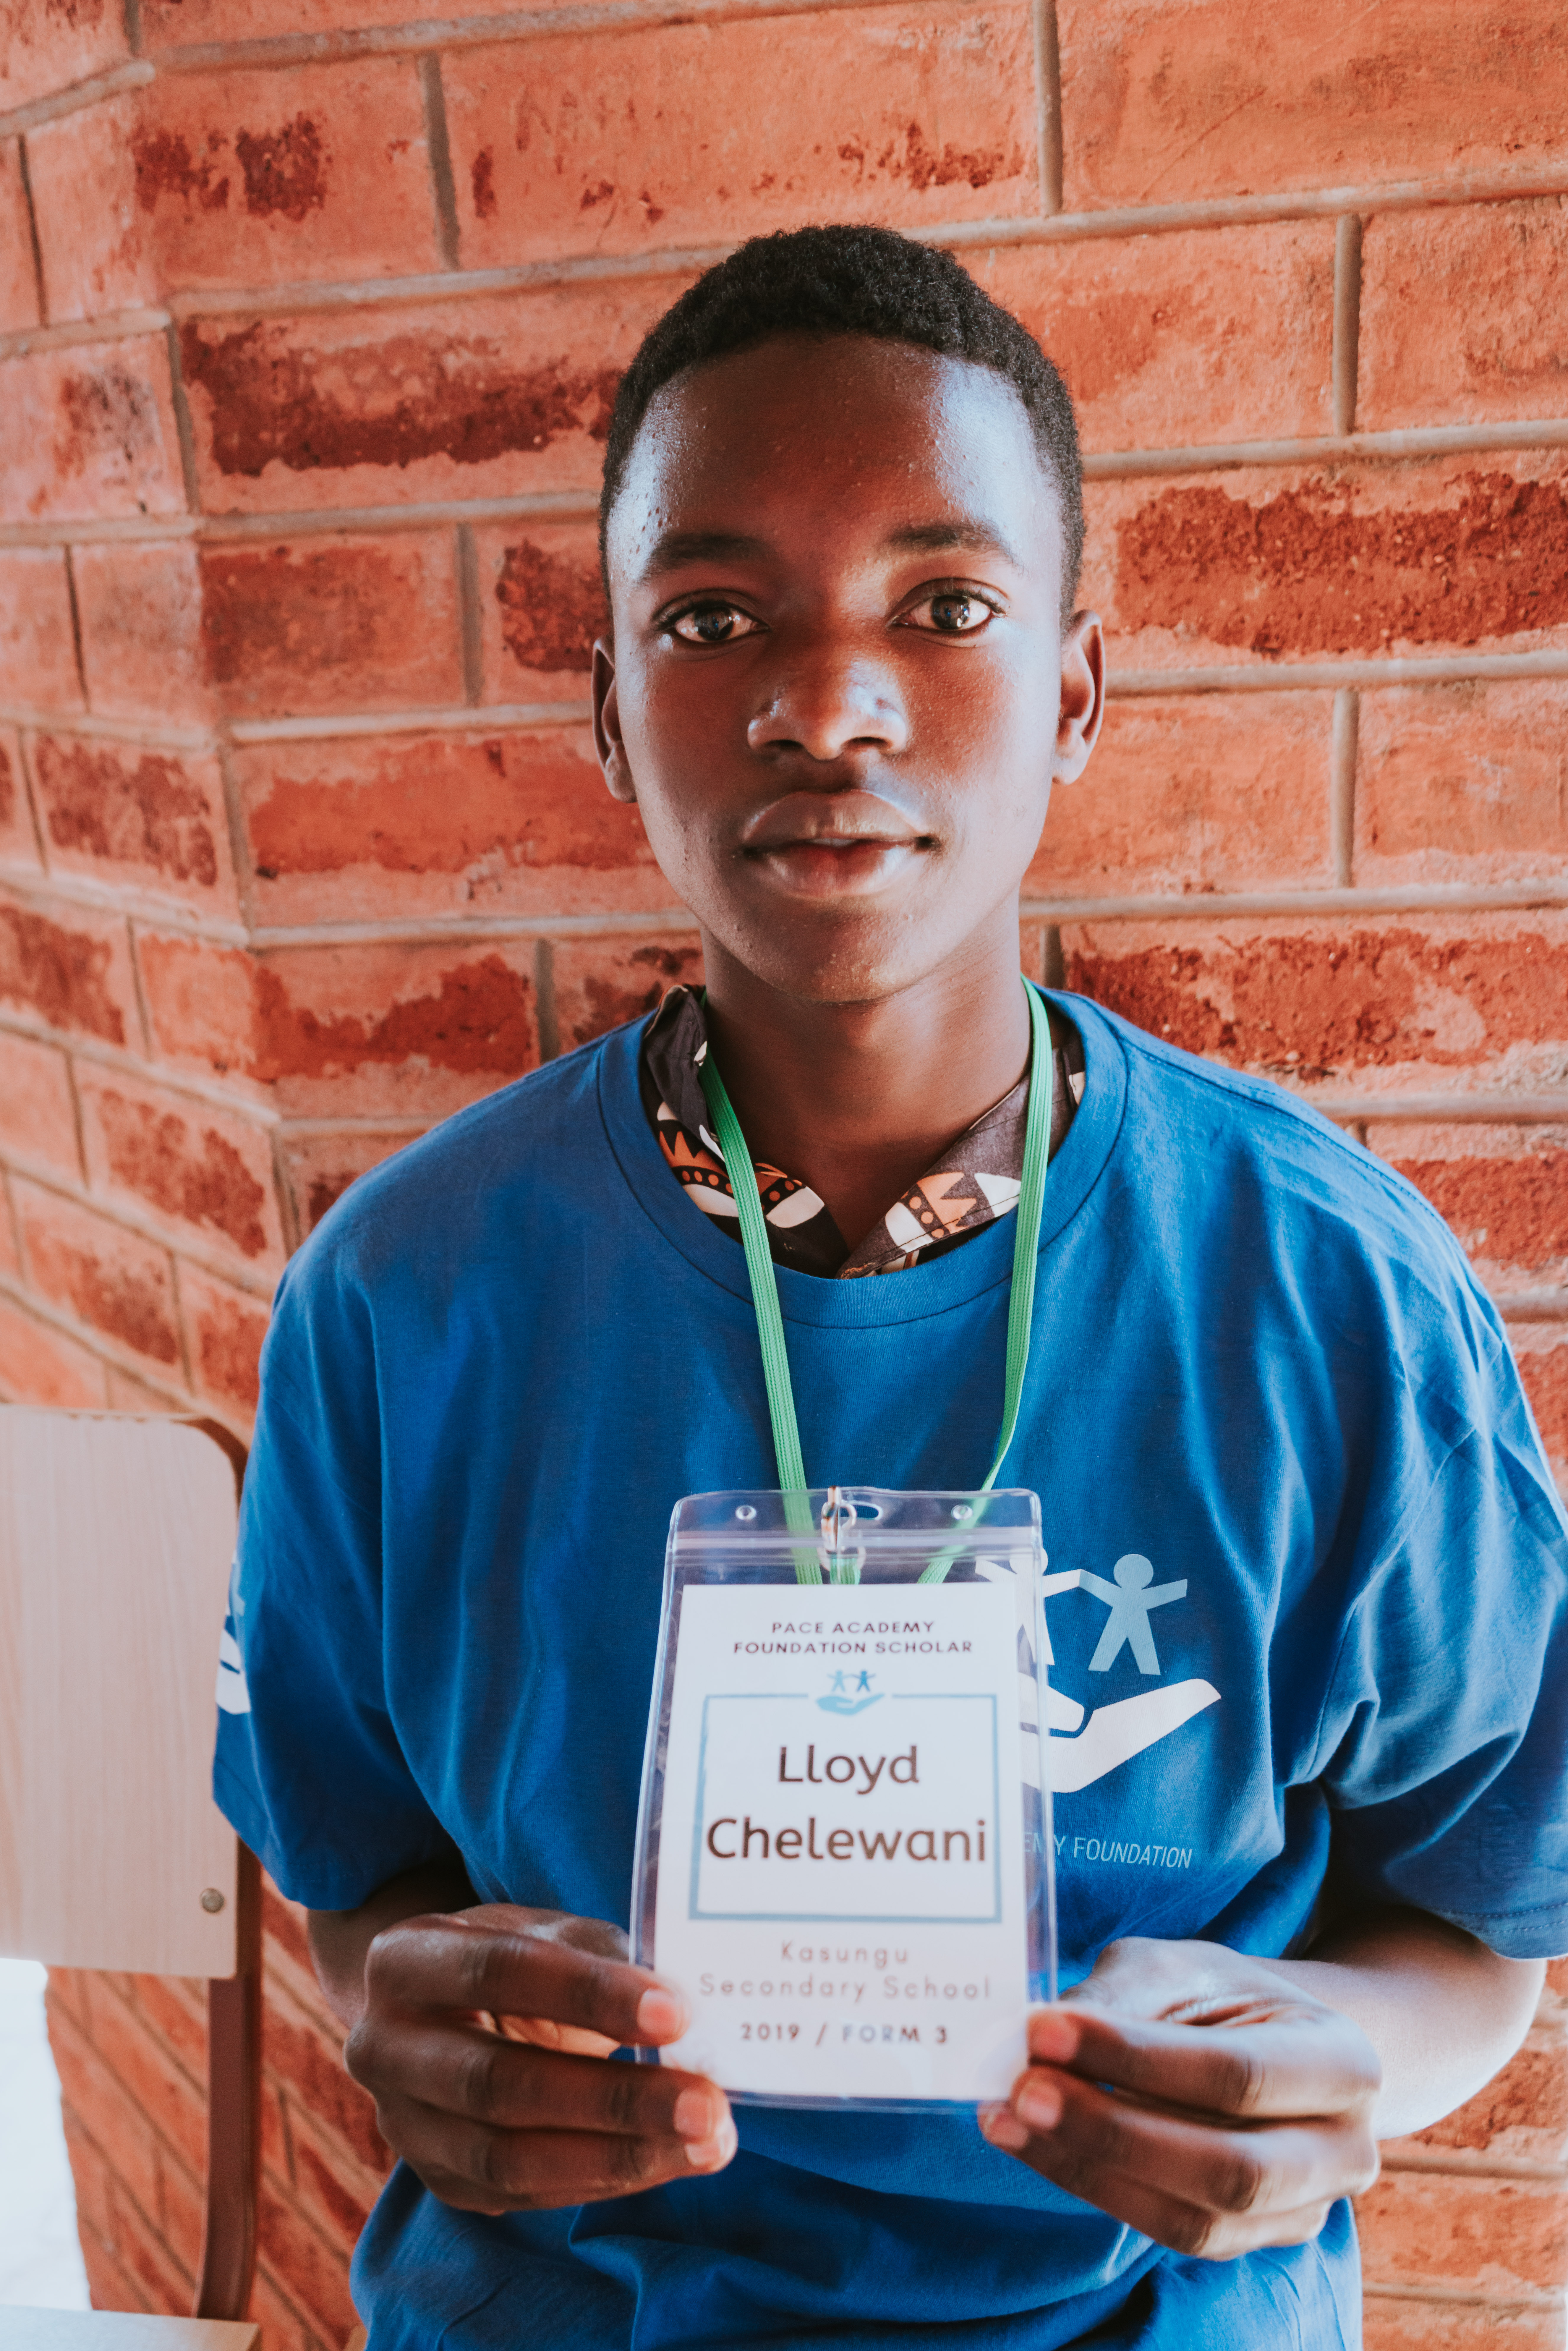 Lloyd Chelewani (Kasungu Secondary Schoo